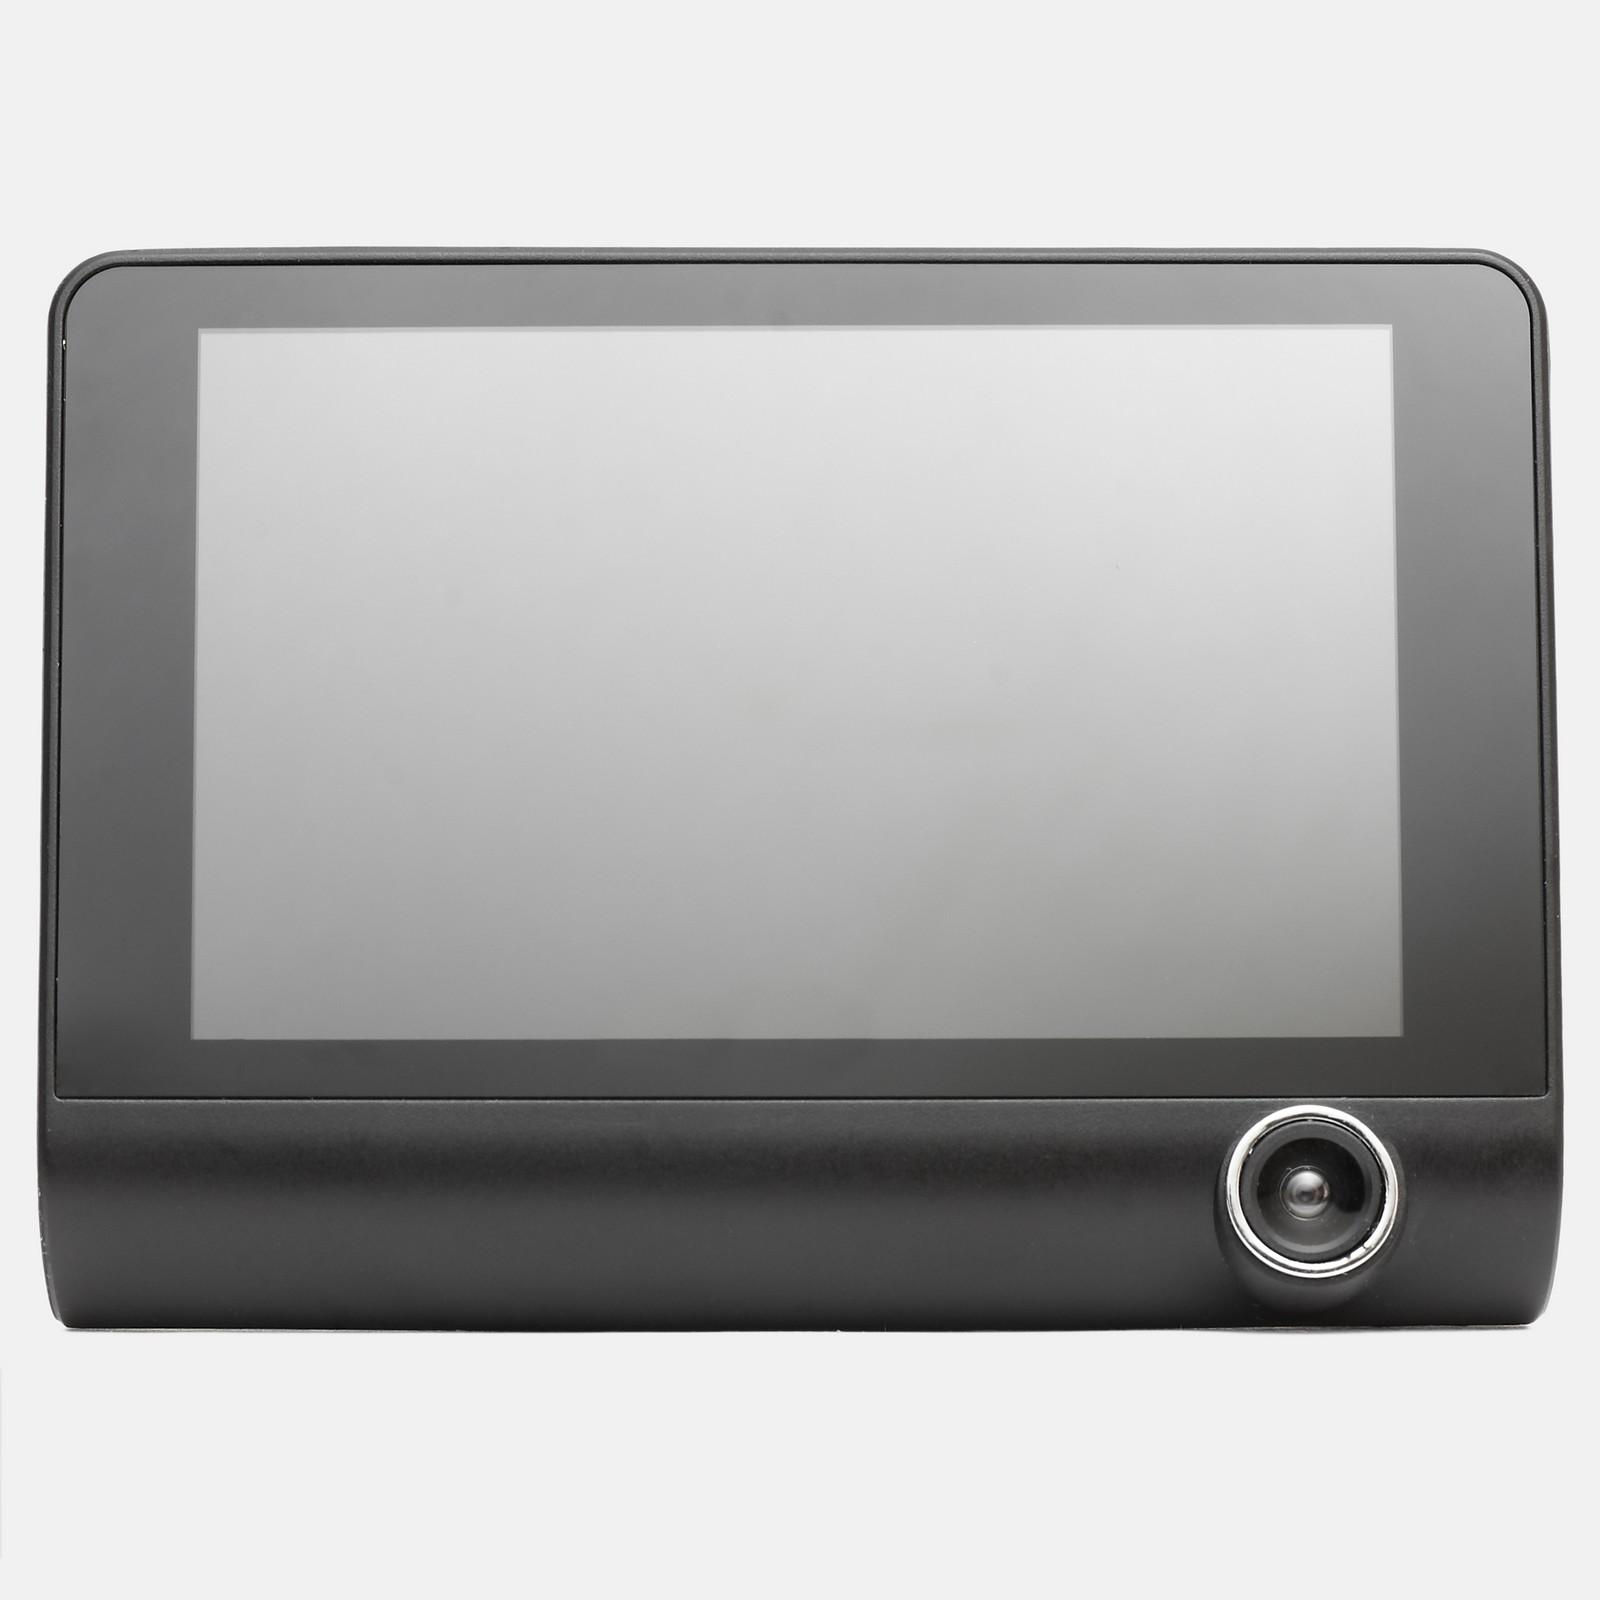 Видеорегистратор T655 HDR LCD 4.0 Full HD 3 камеры